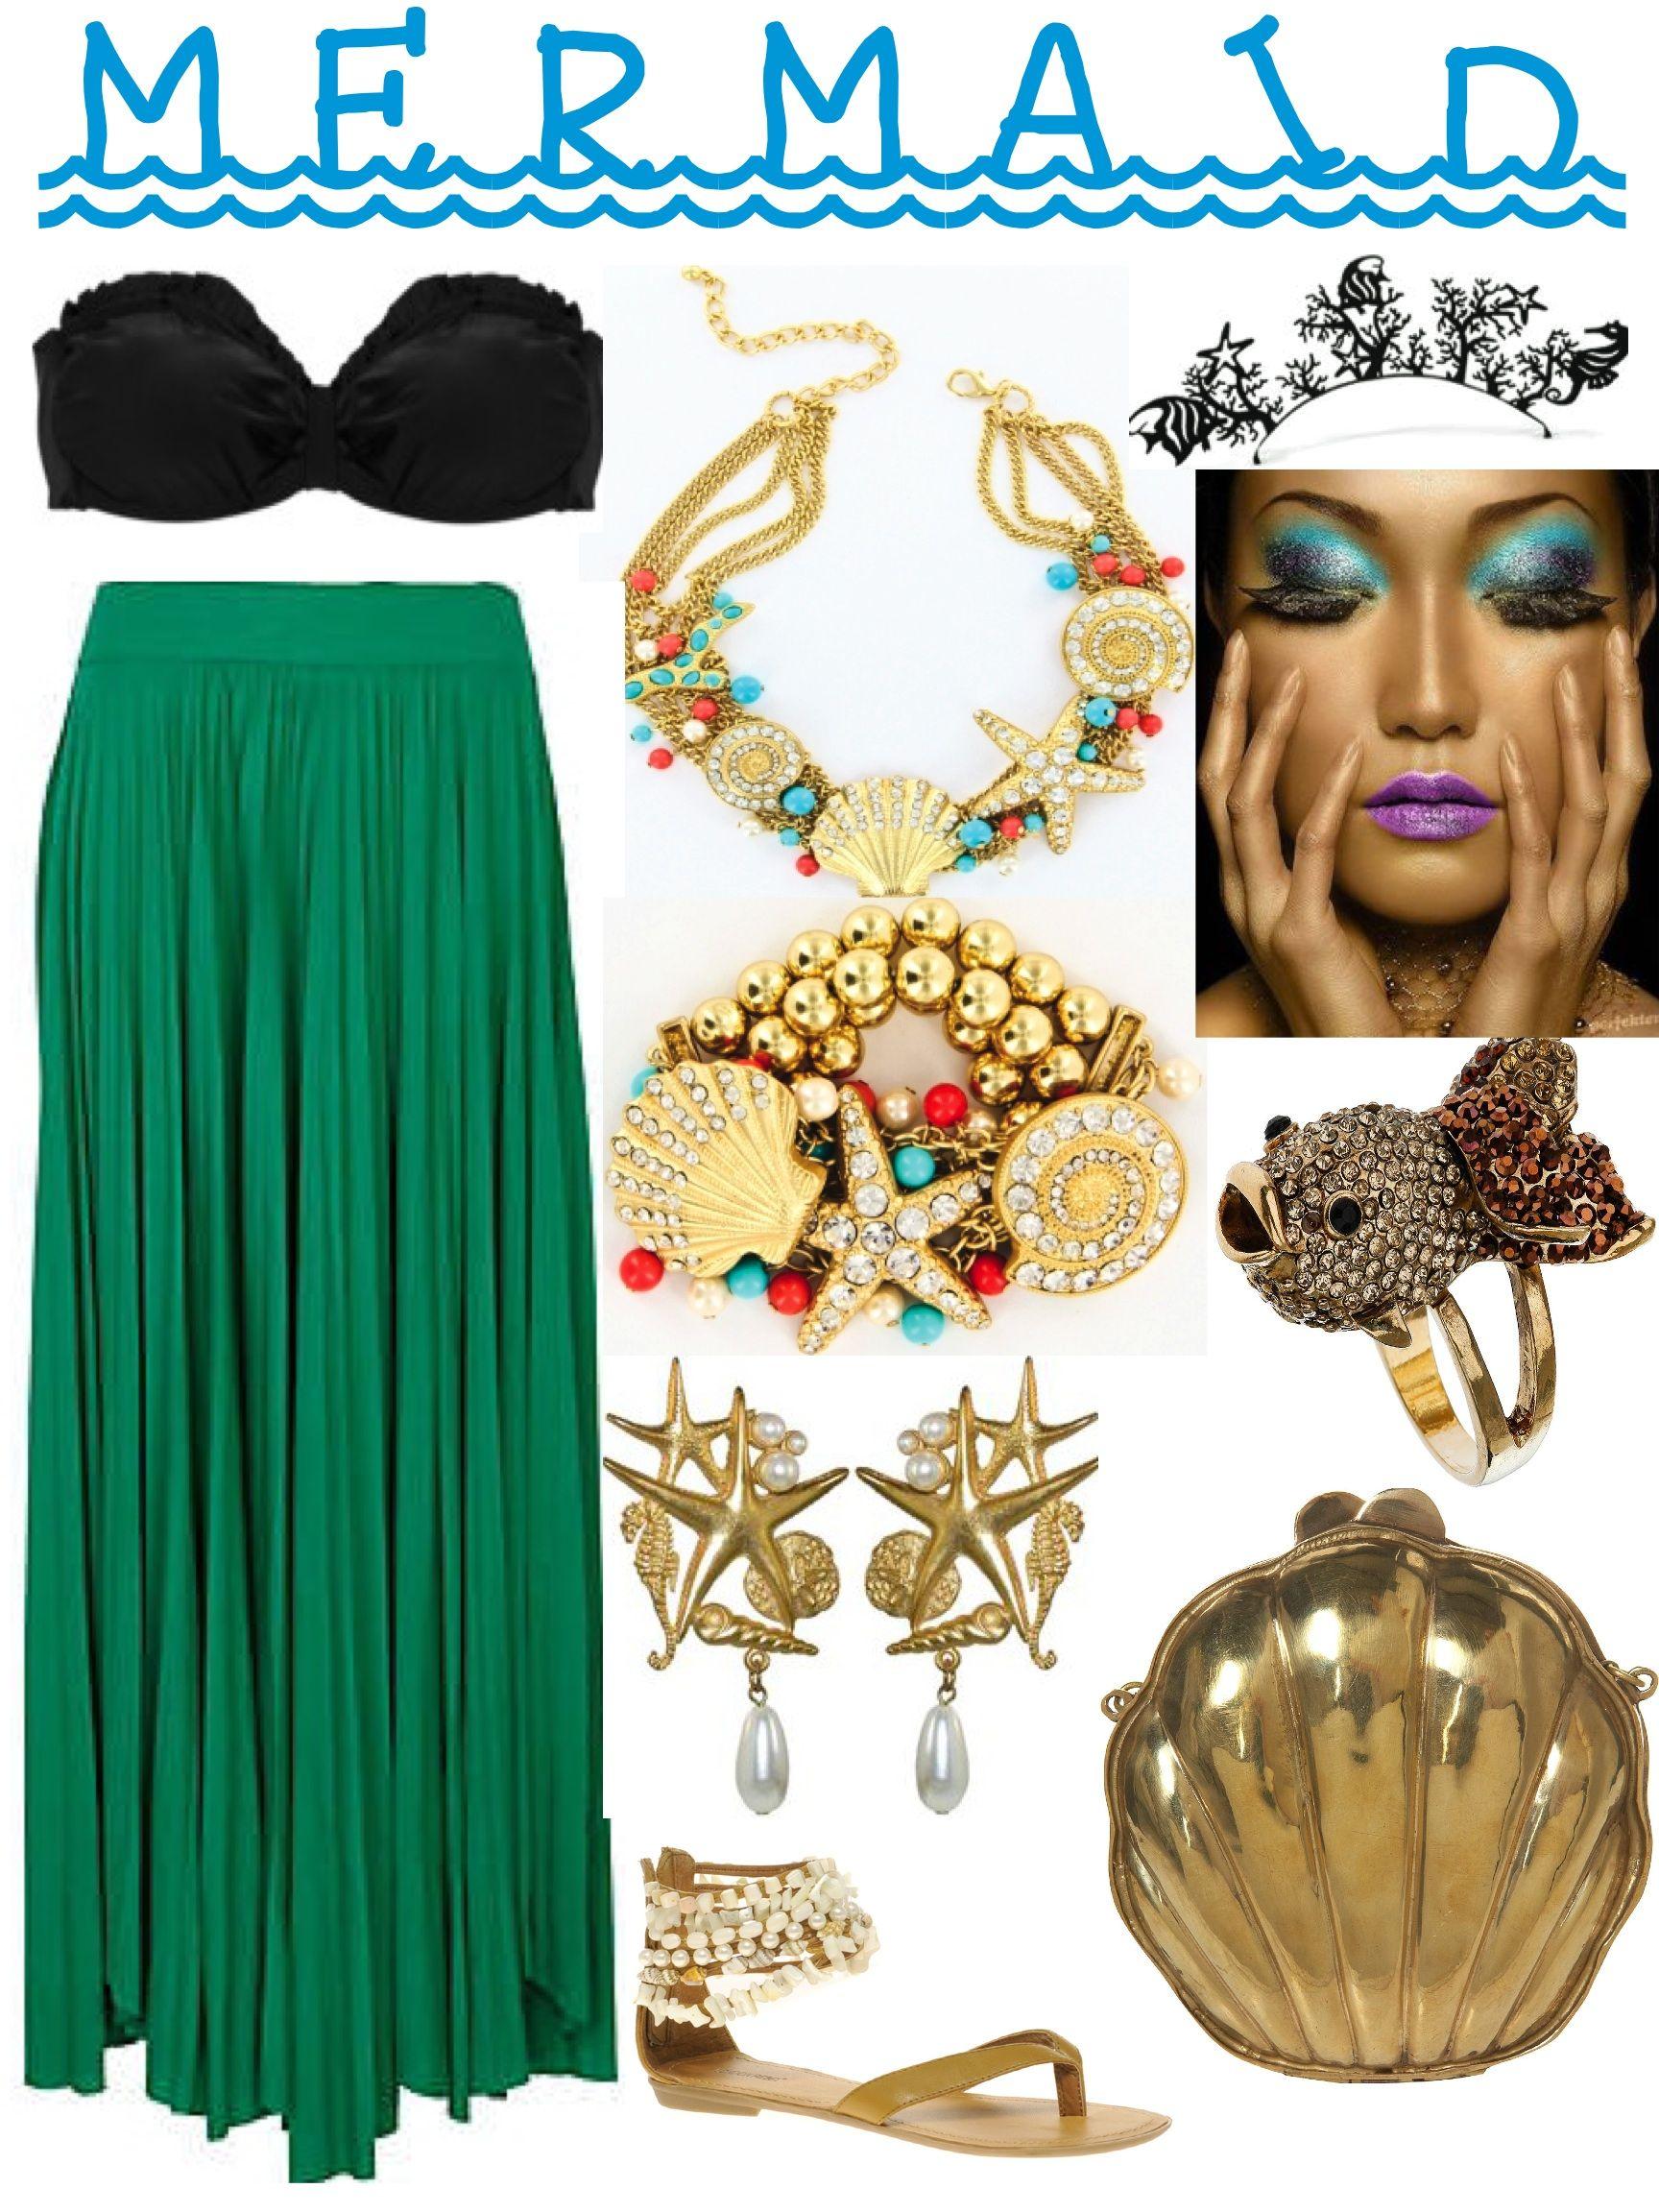 Ariel diy costume full diy mermaid costume post - Mermaid Costume Ideas